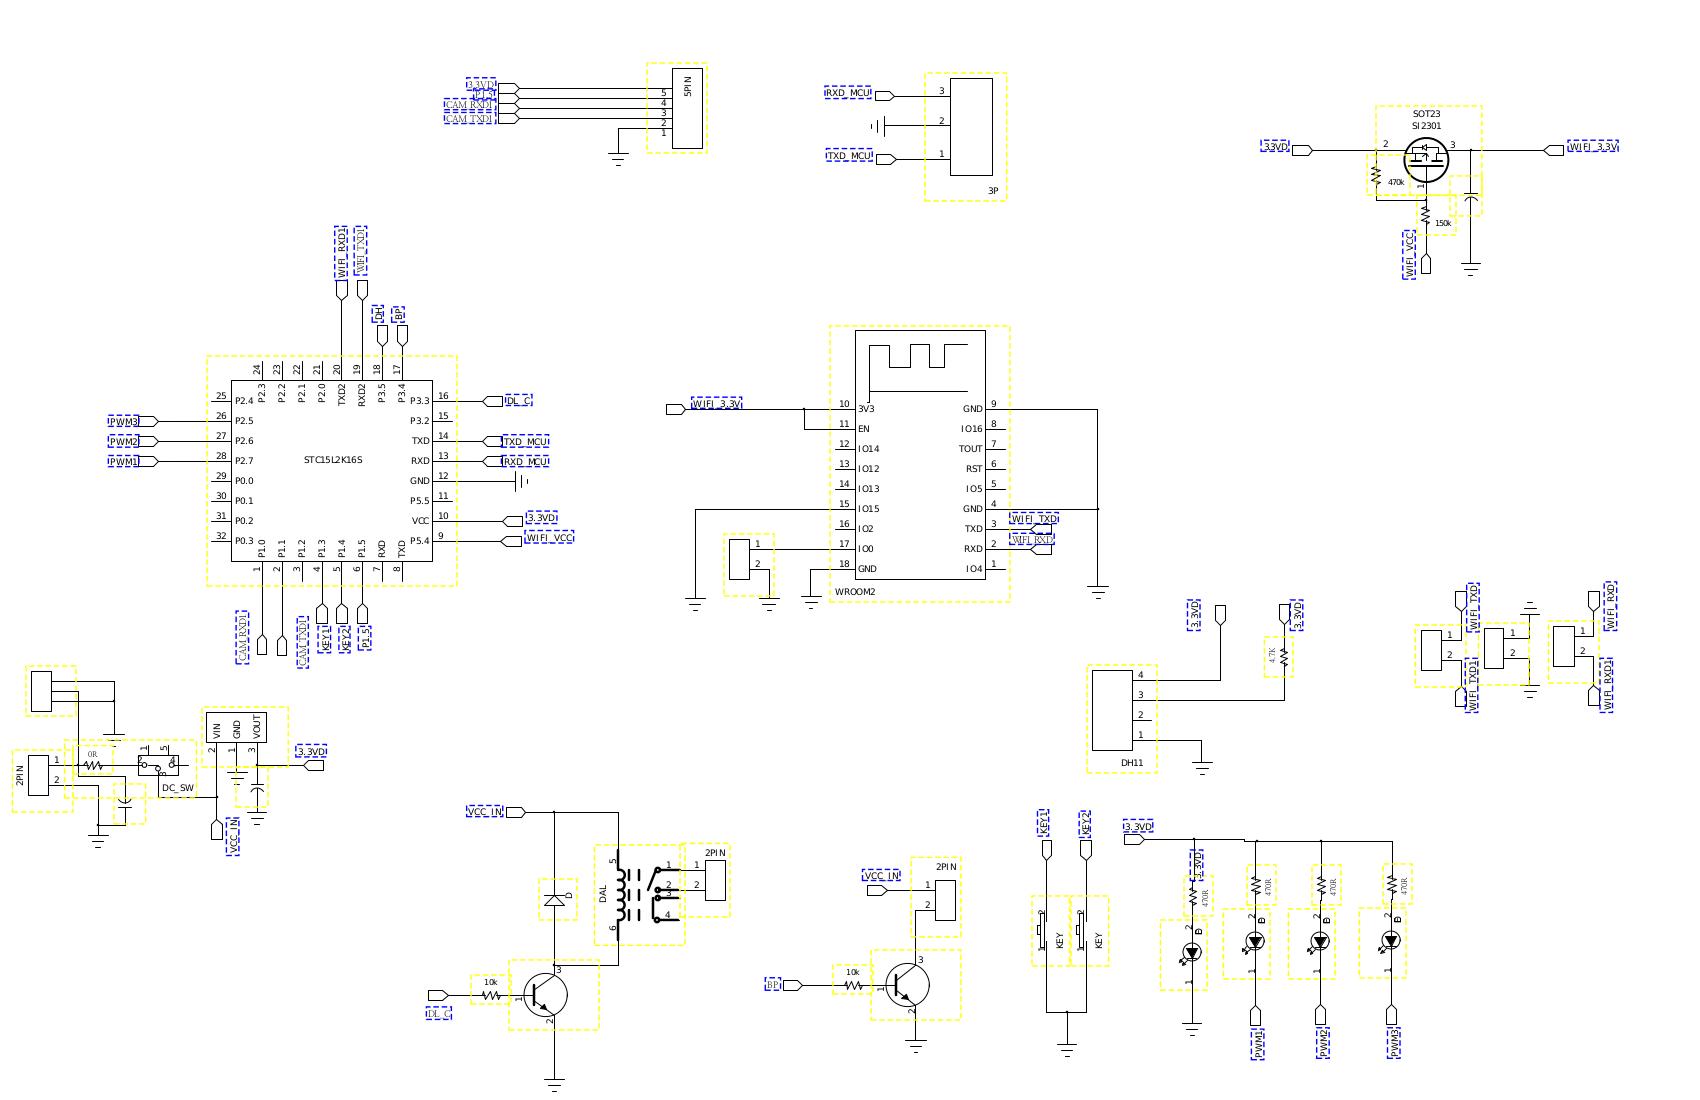 hight resolution of t5 8 block diagram schema diagram databaset5 2 block diagram wiring diagram t5 8 block diagram